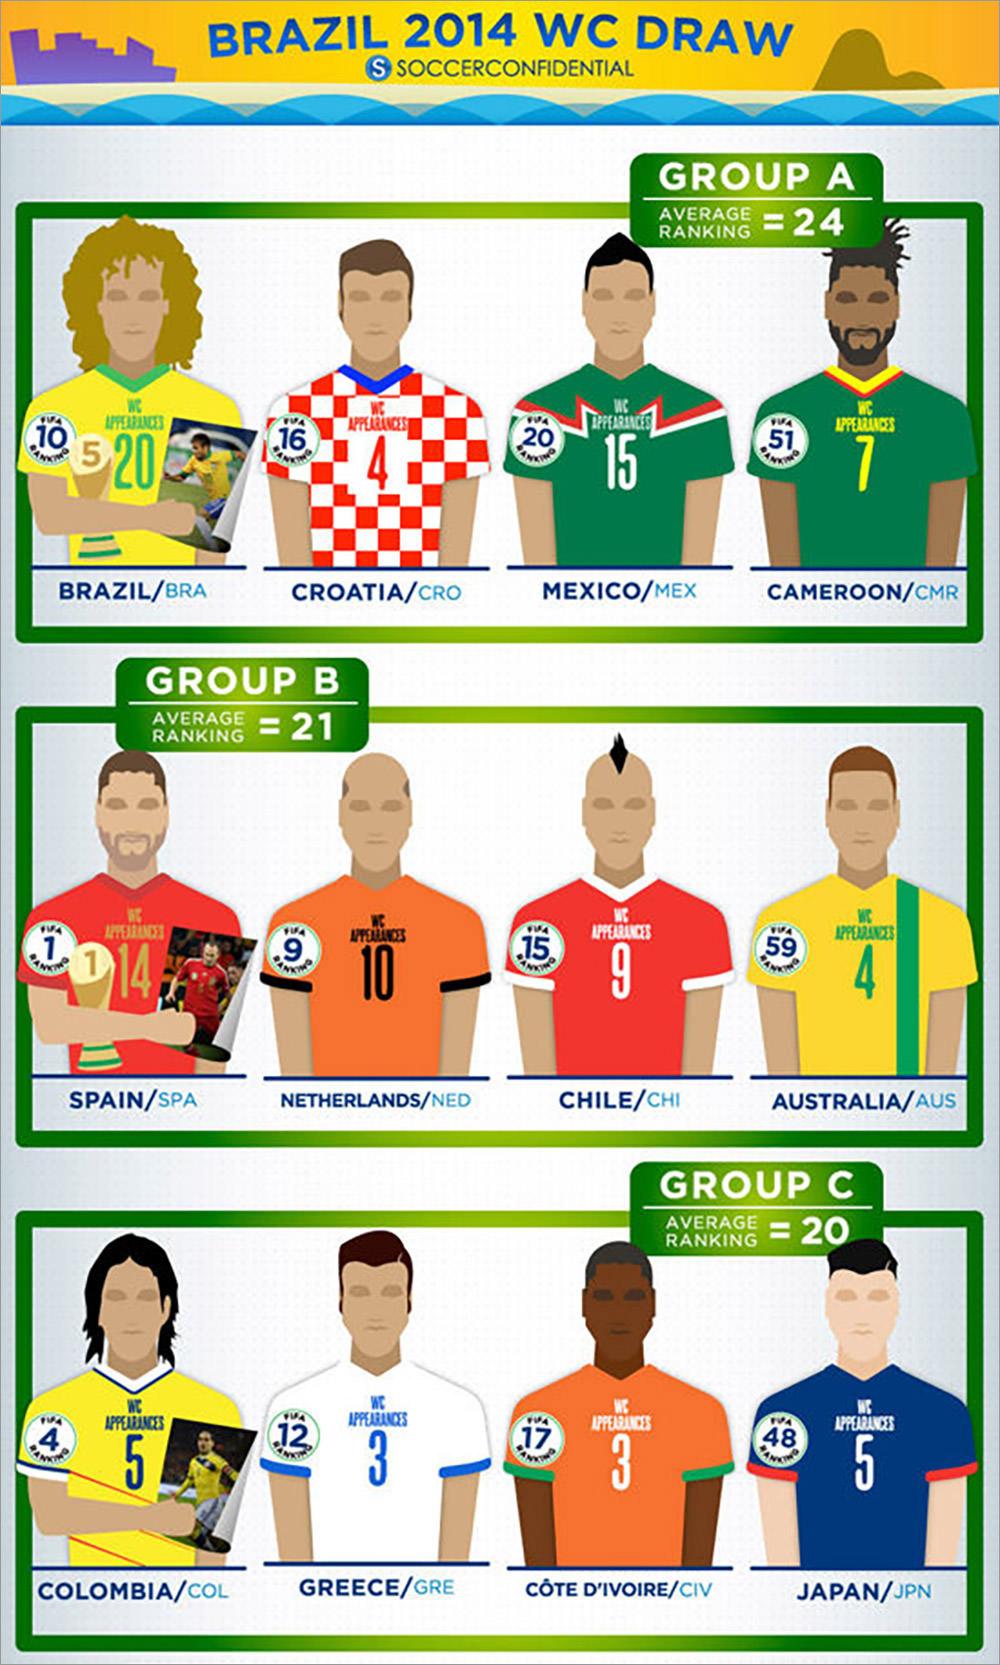 Brazil 2014 WC Draw